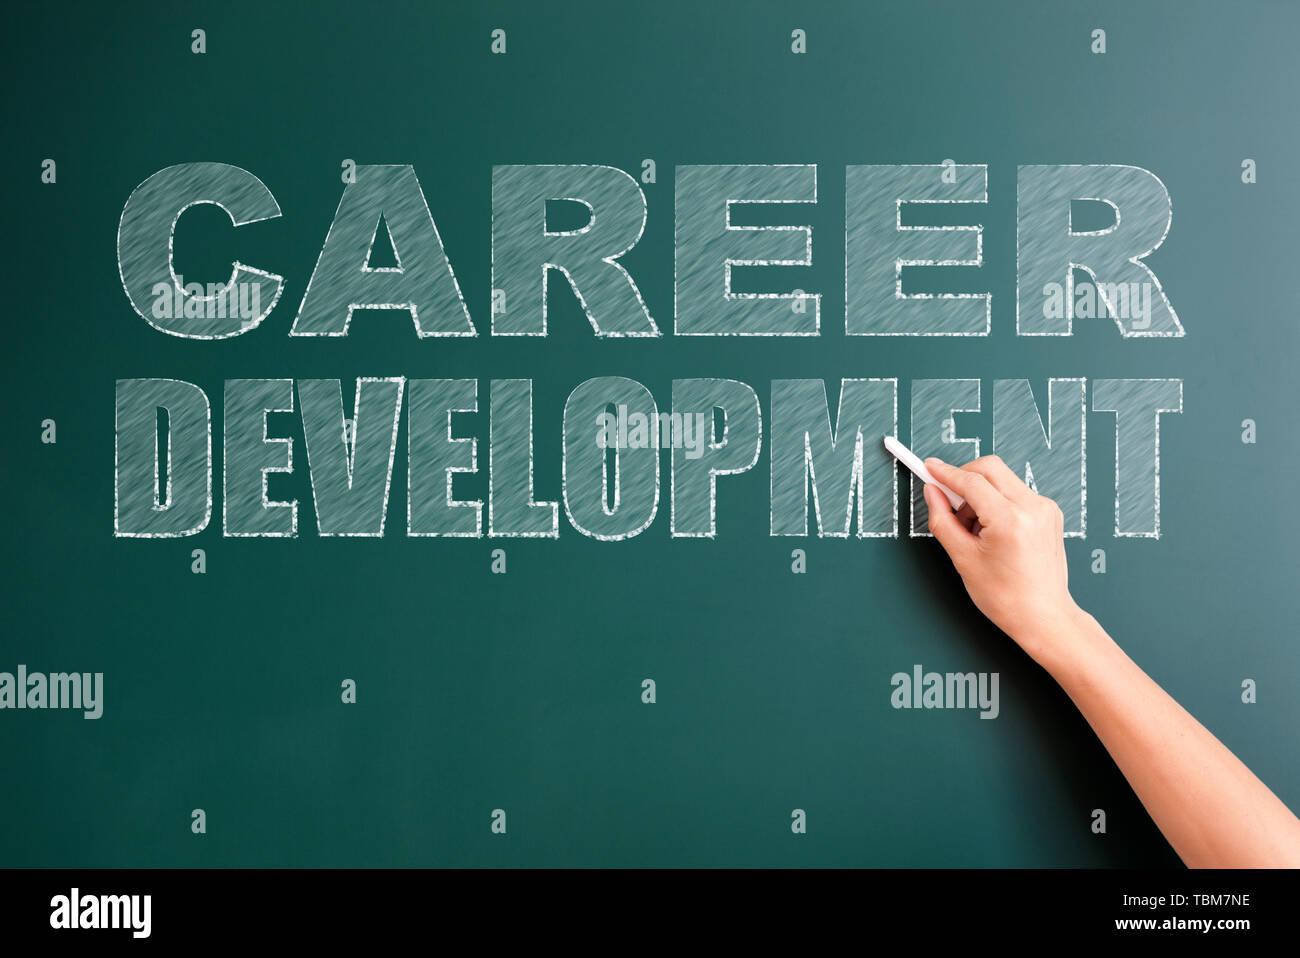 career development written on blackboard - Stock Image